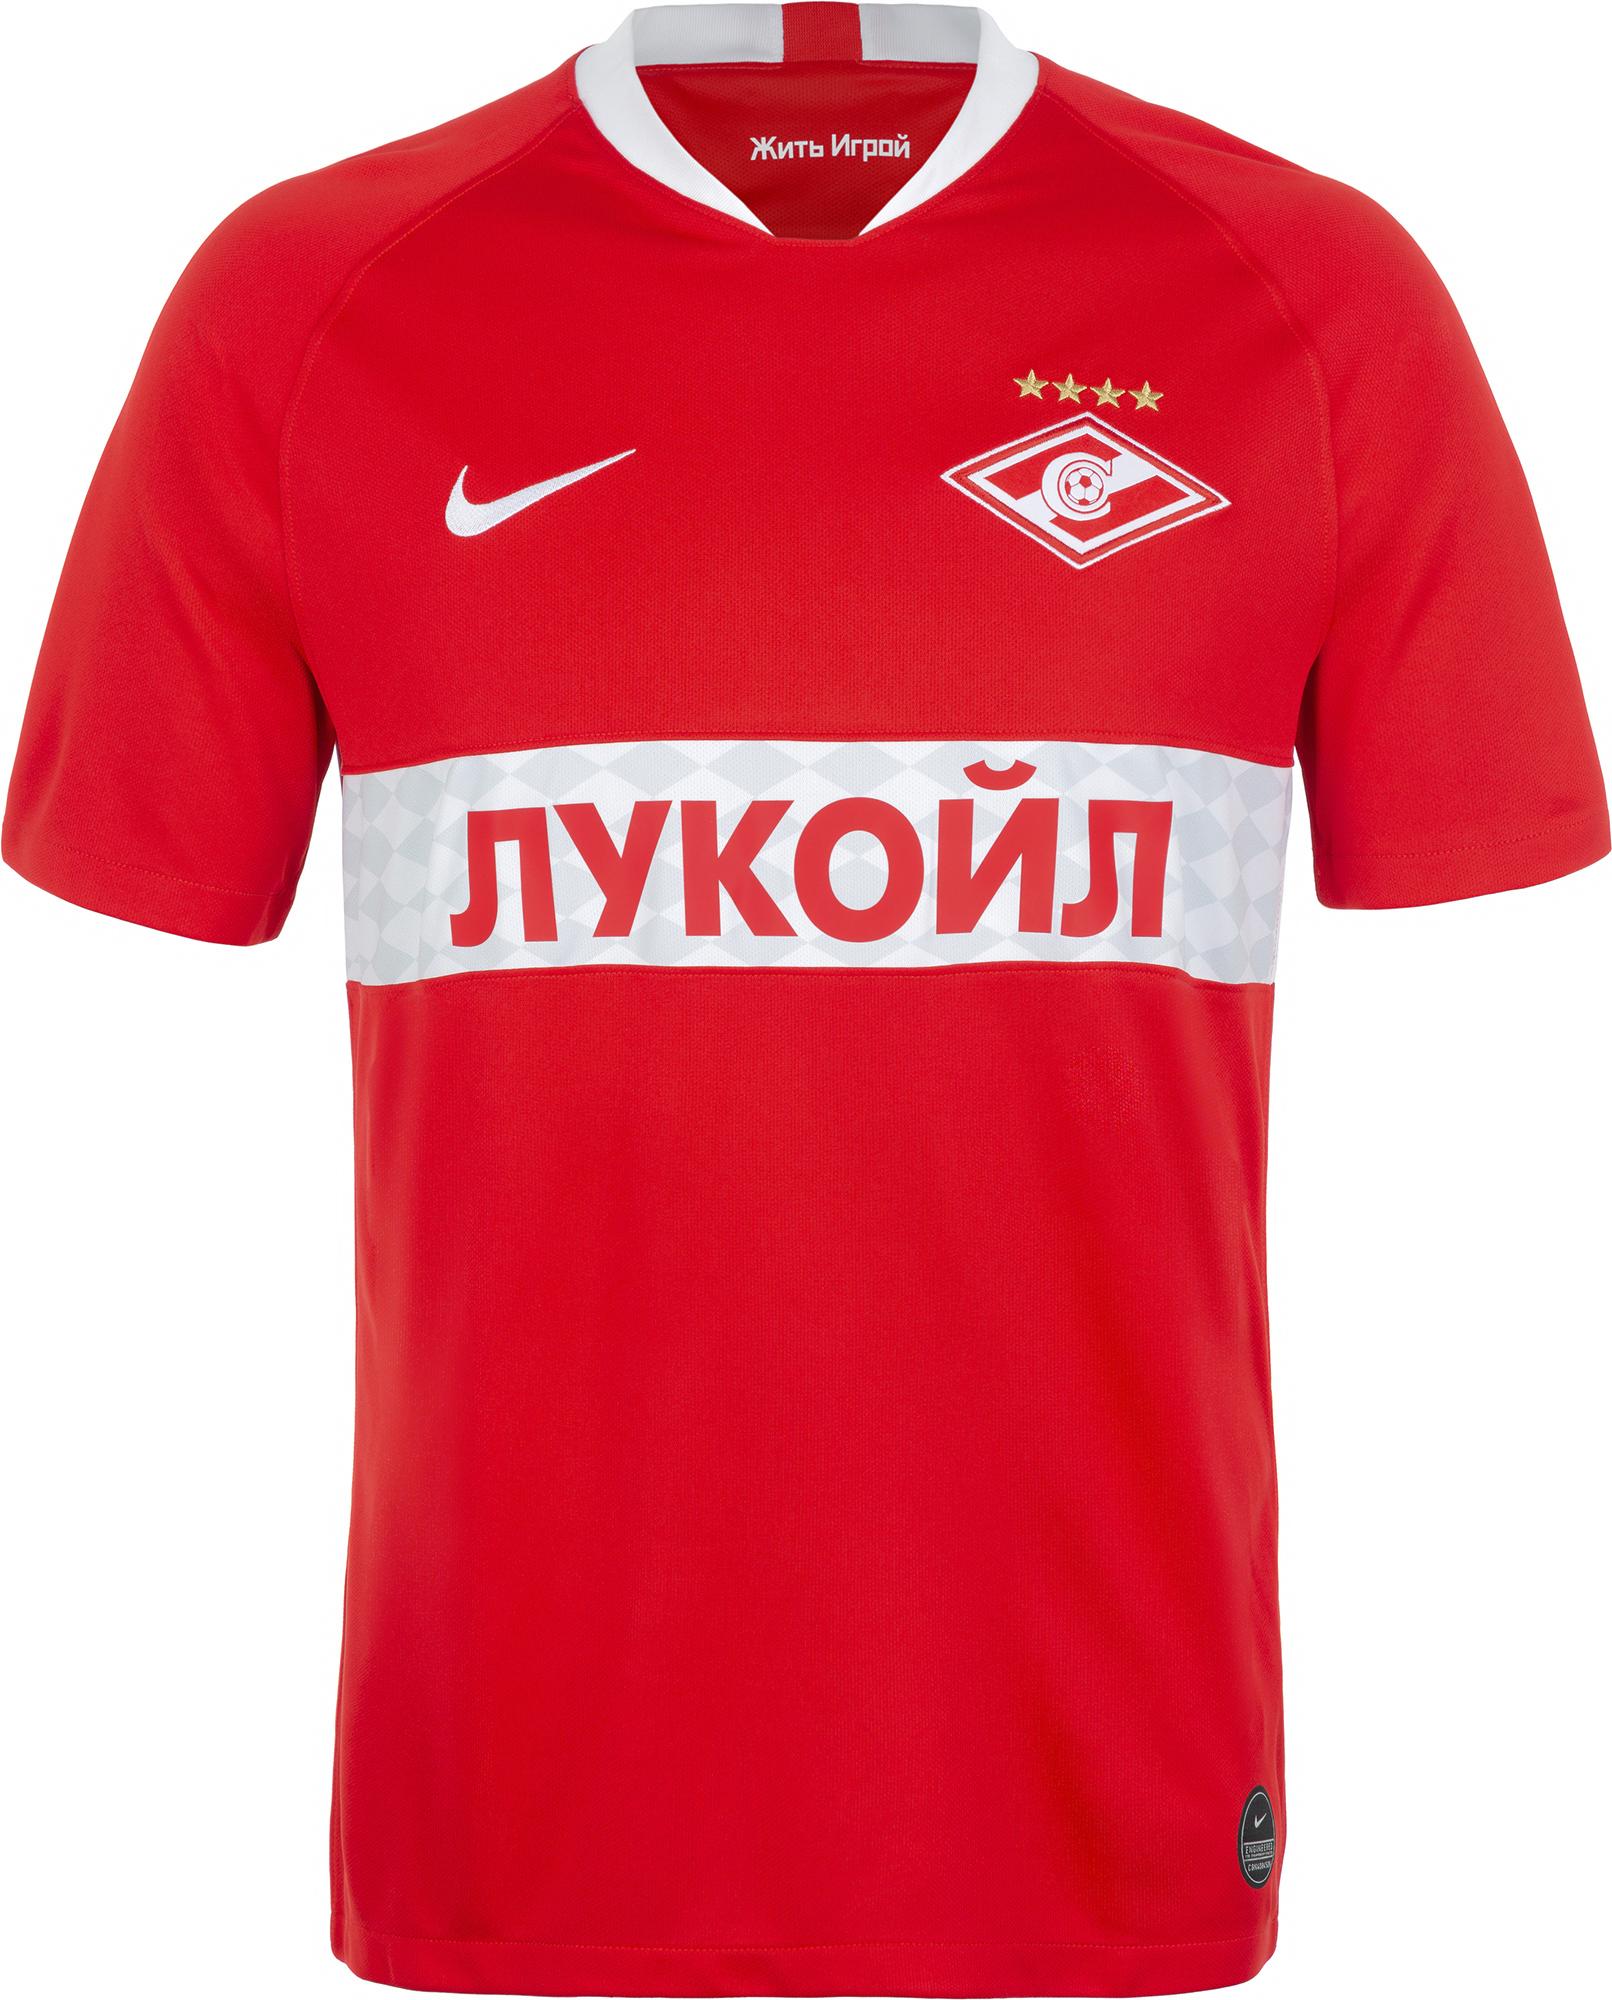 Nike Футболка мужская Nike Spartak Moscow Stadium Home, размер 44-46 женская игровая футболка nike barcelona home stadium 894447 456